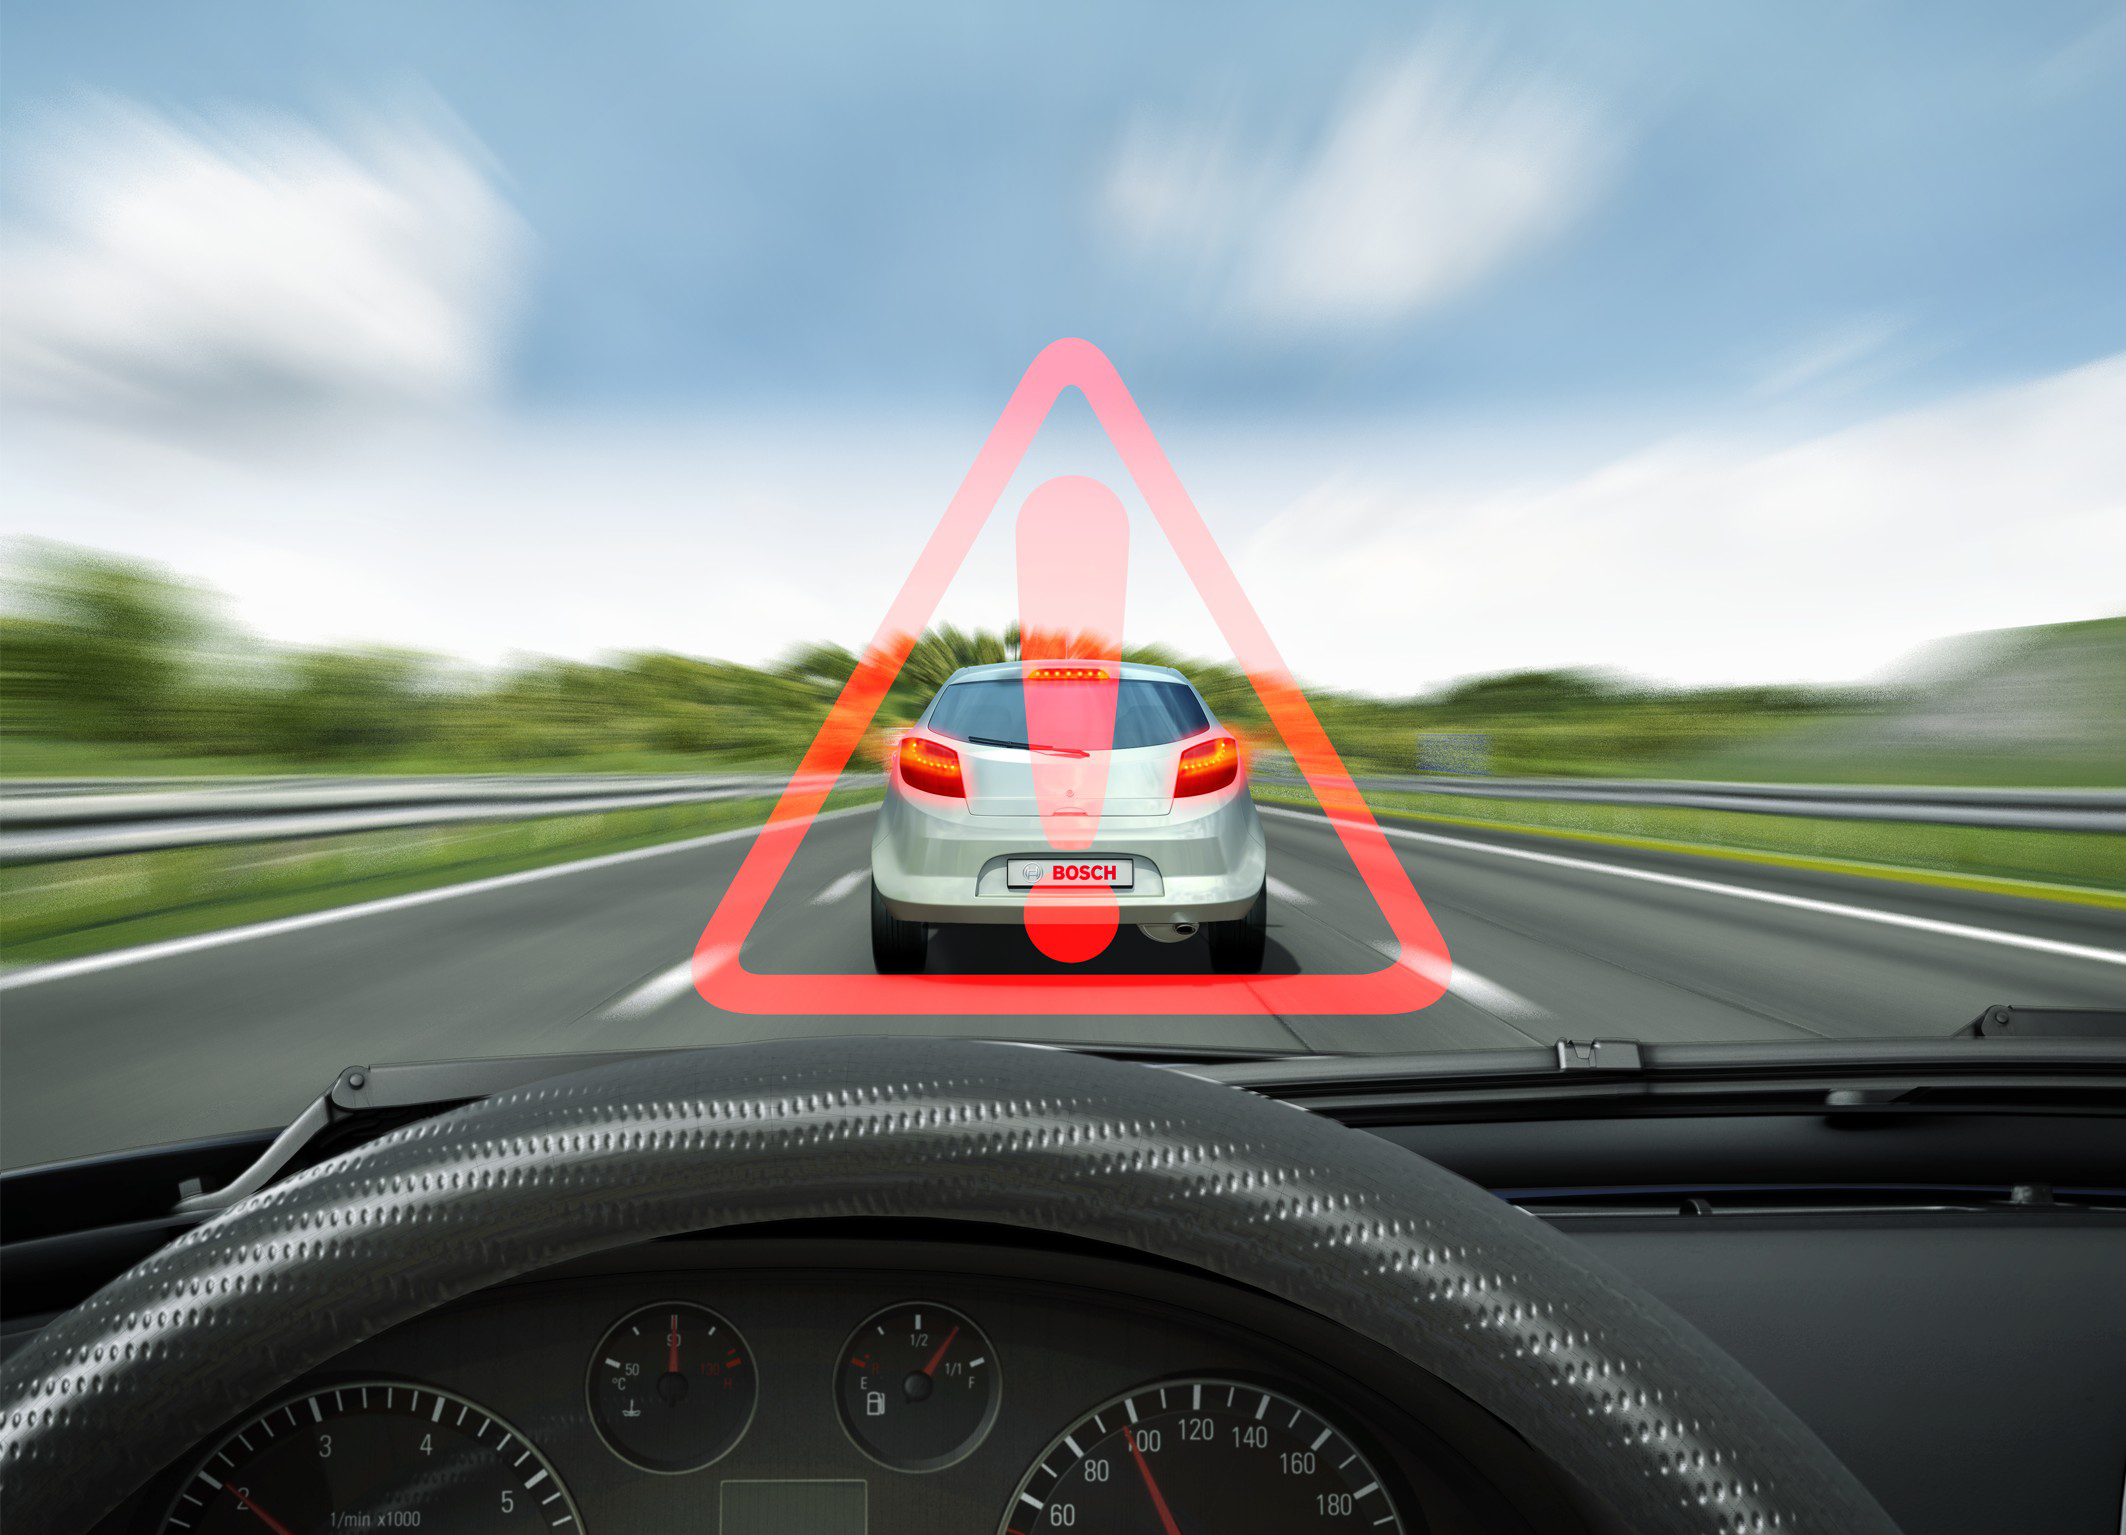 Predictive collision warning